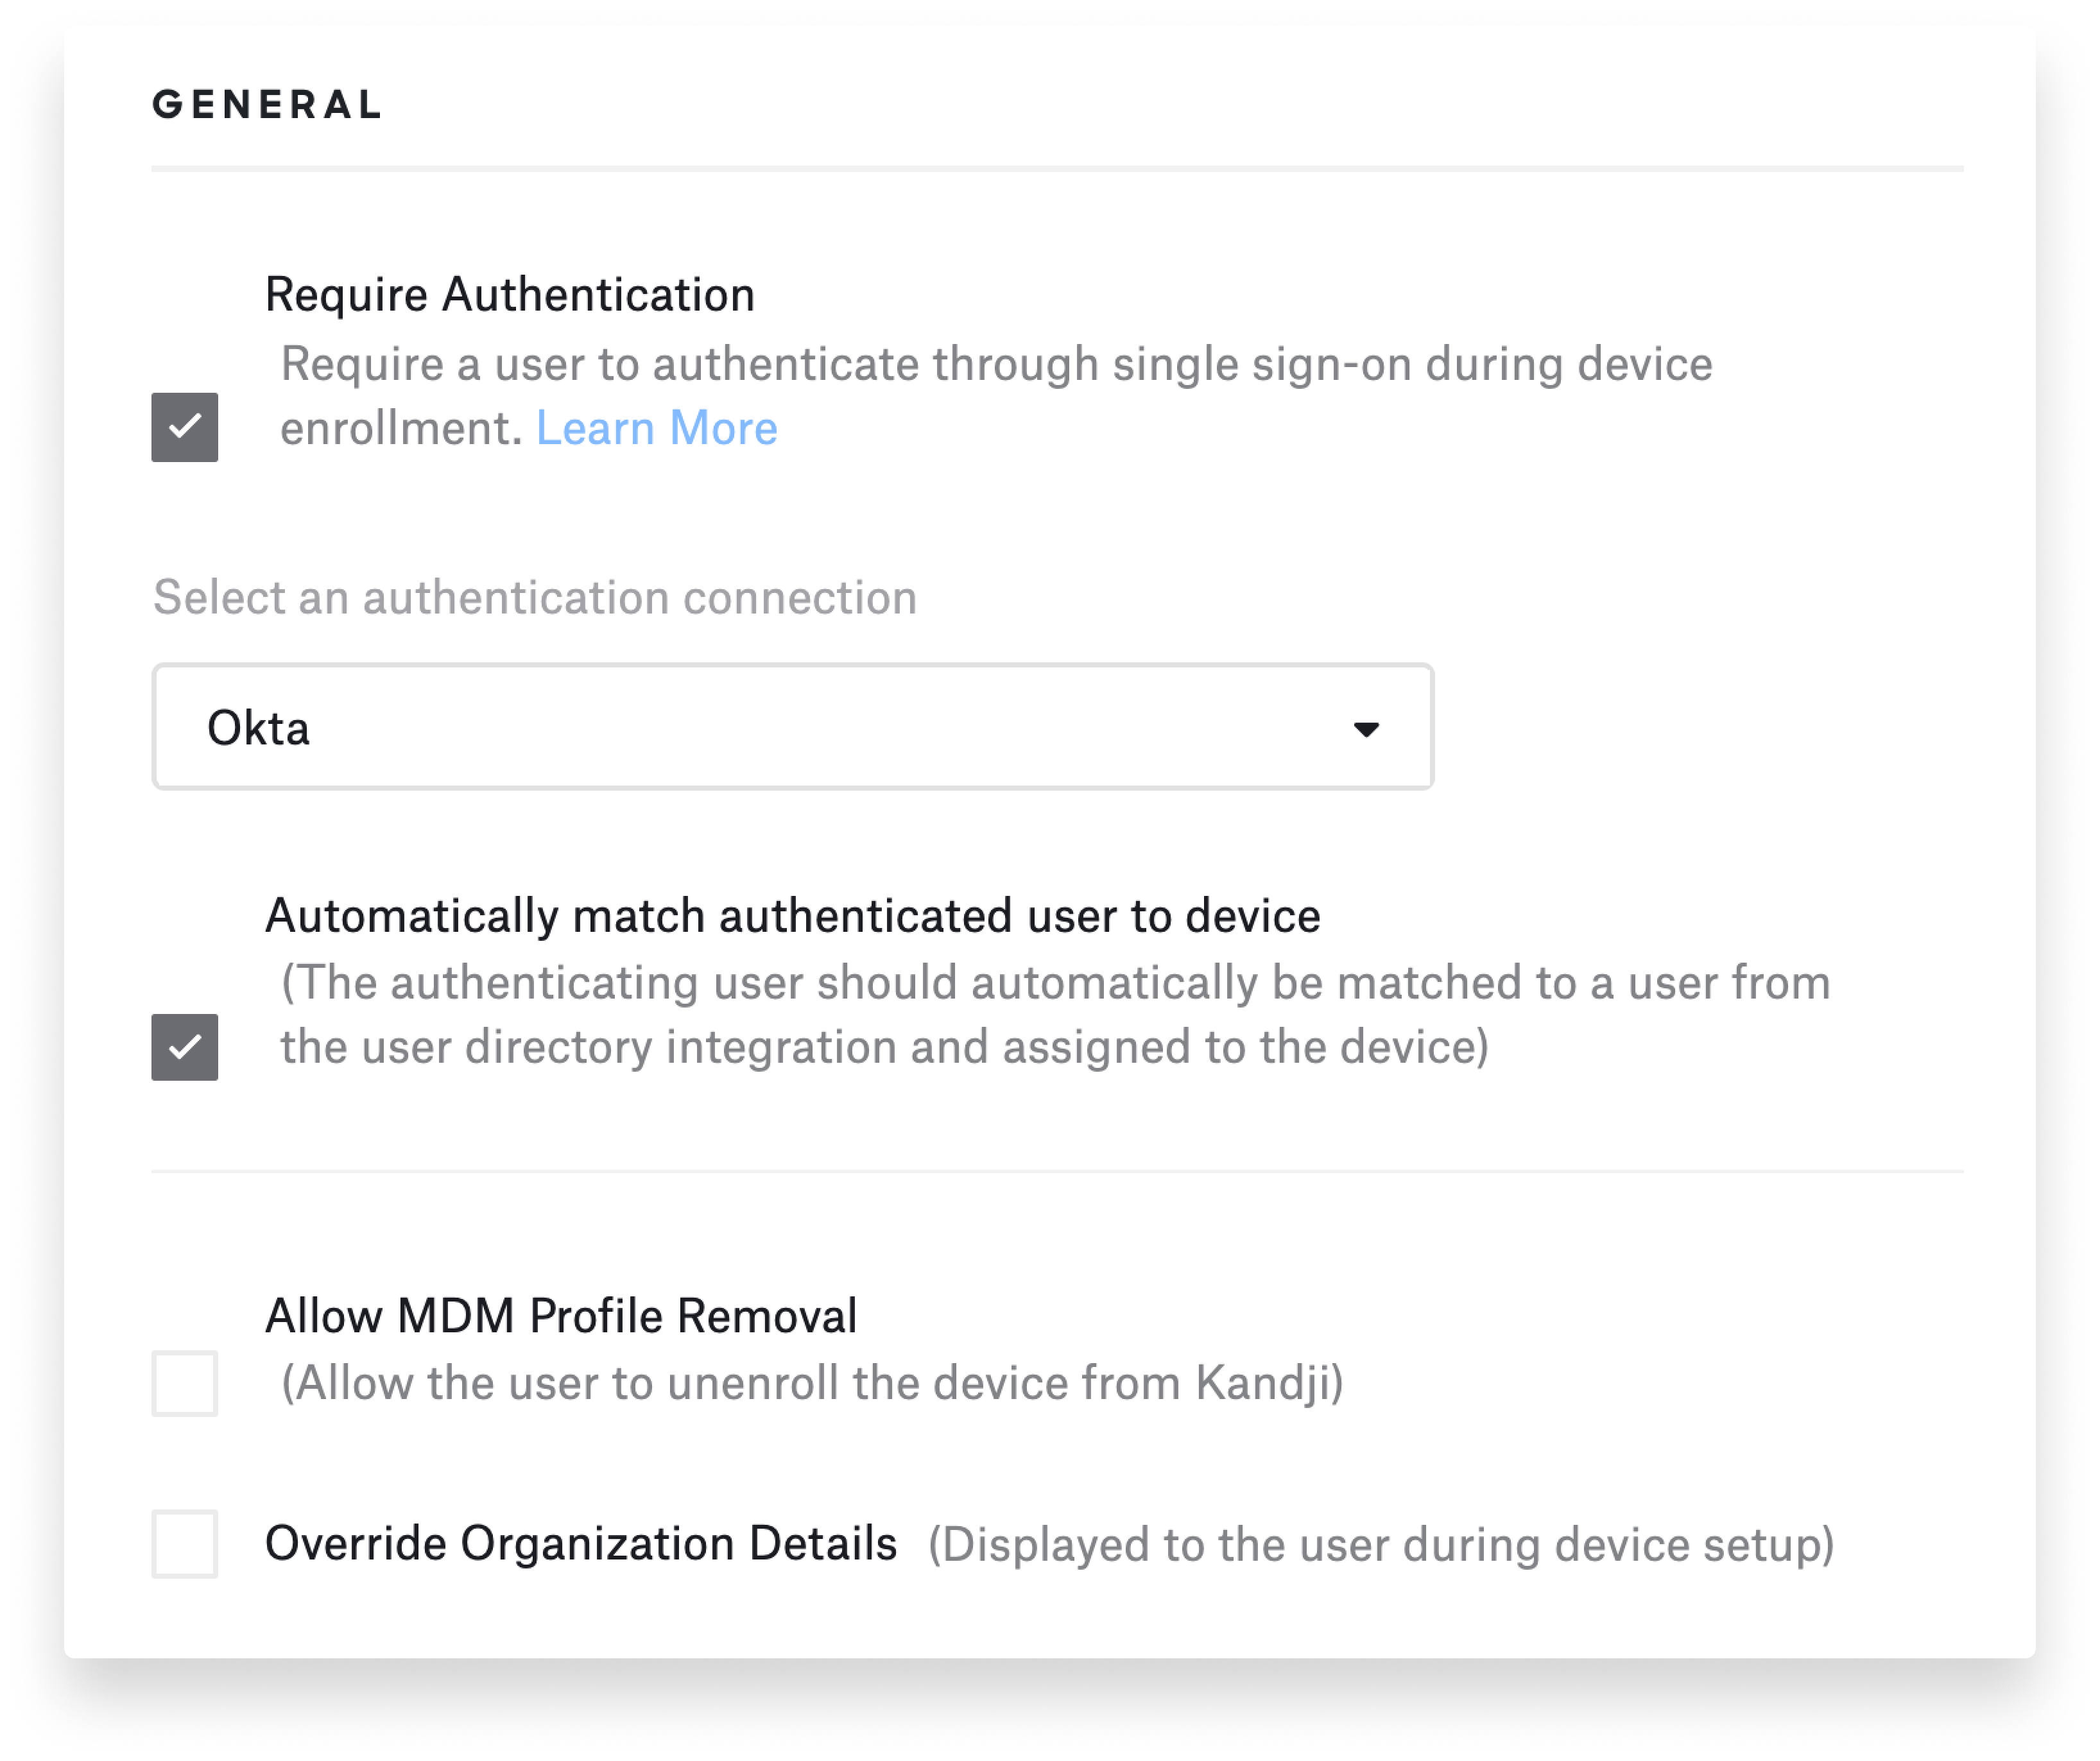 Configuring enrollment customization